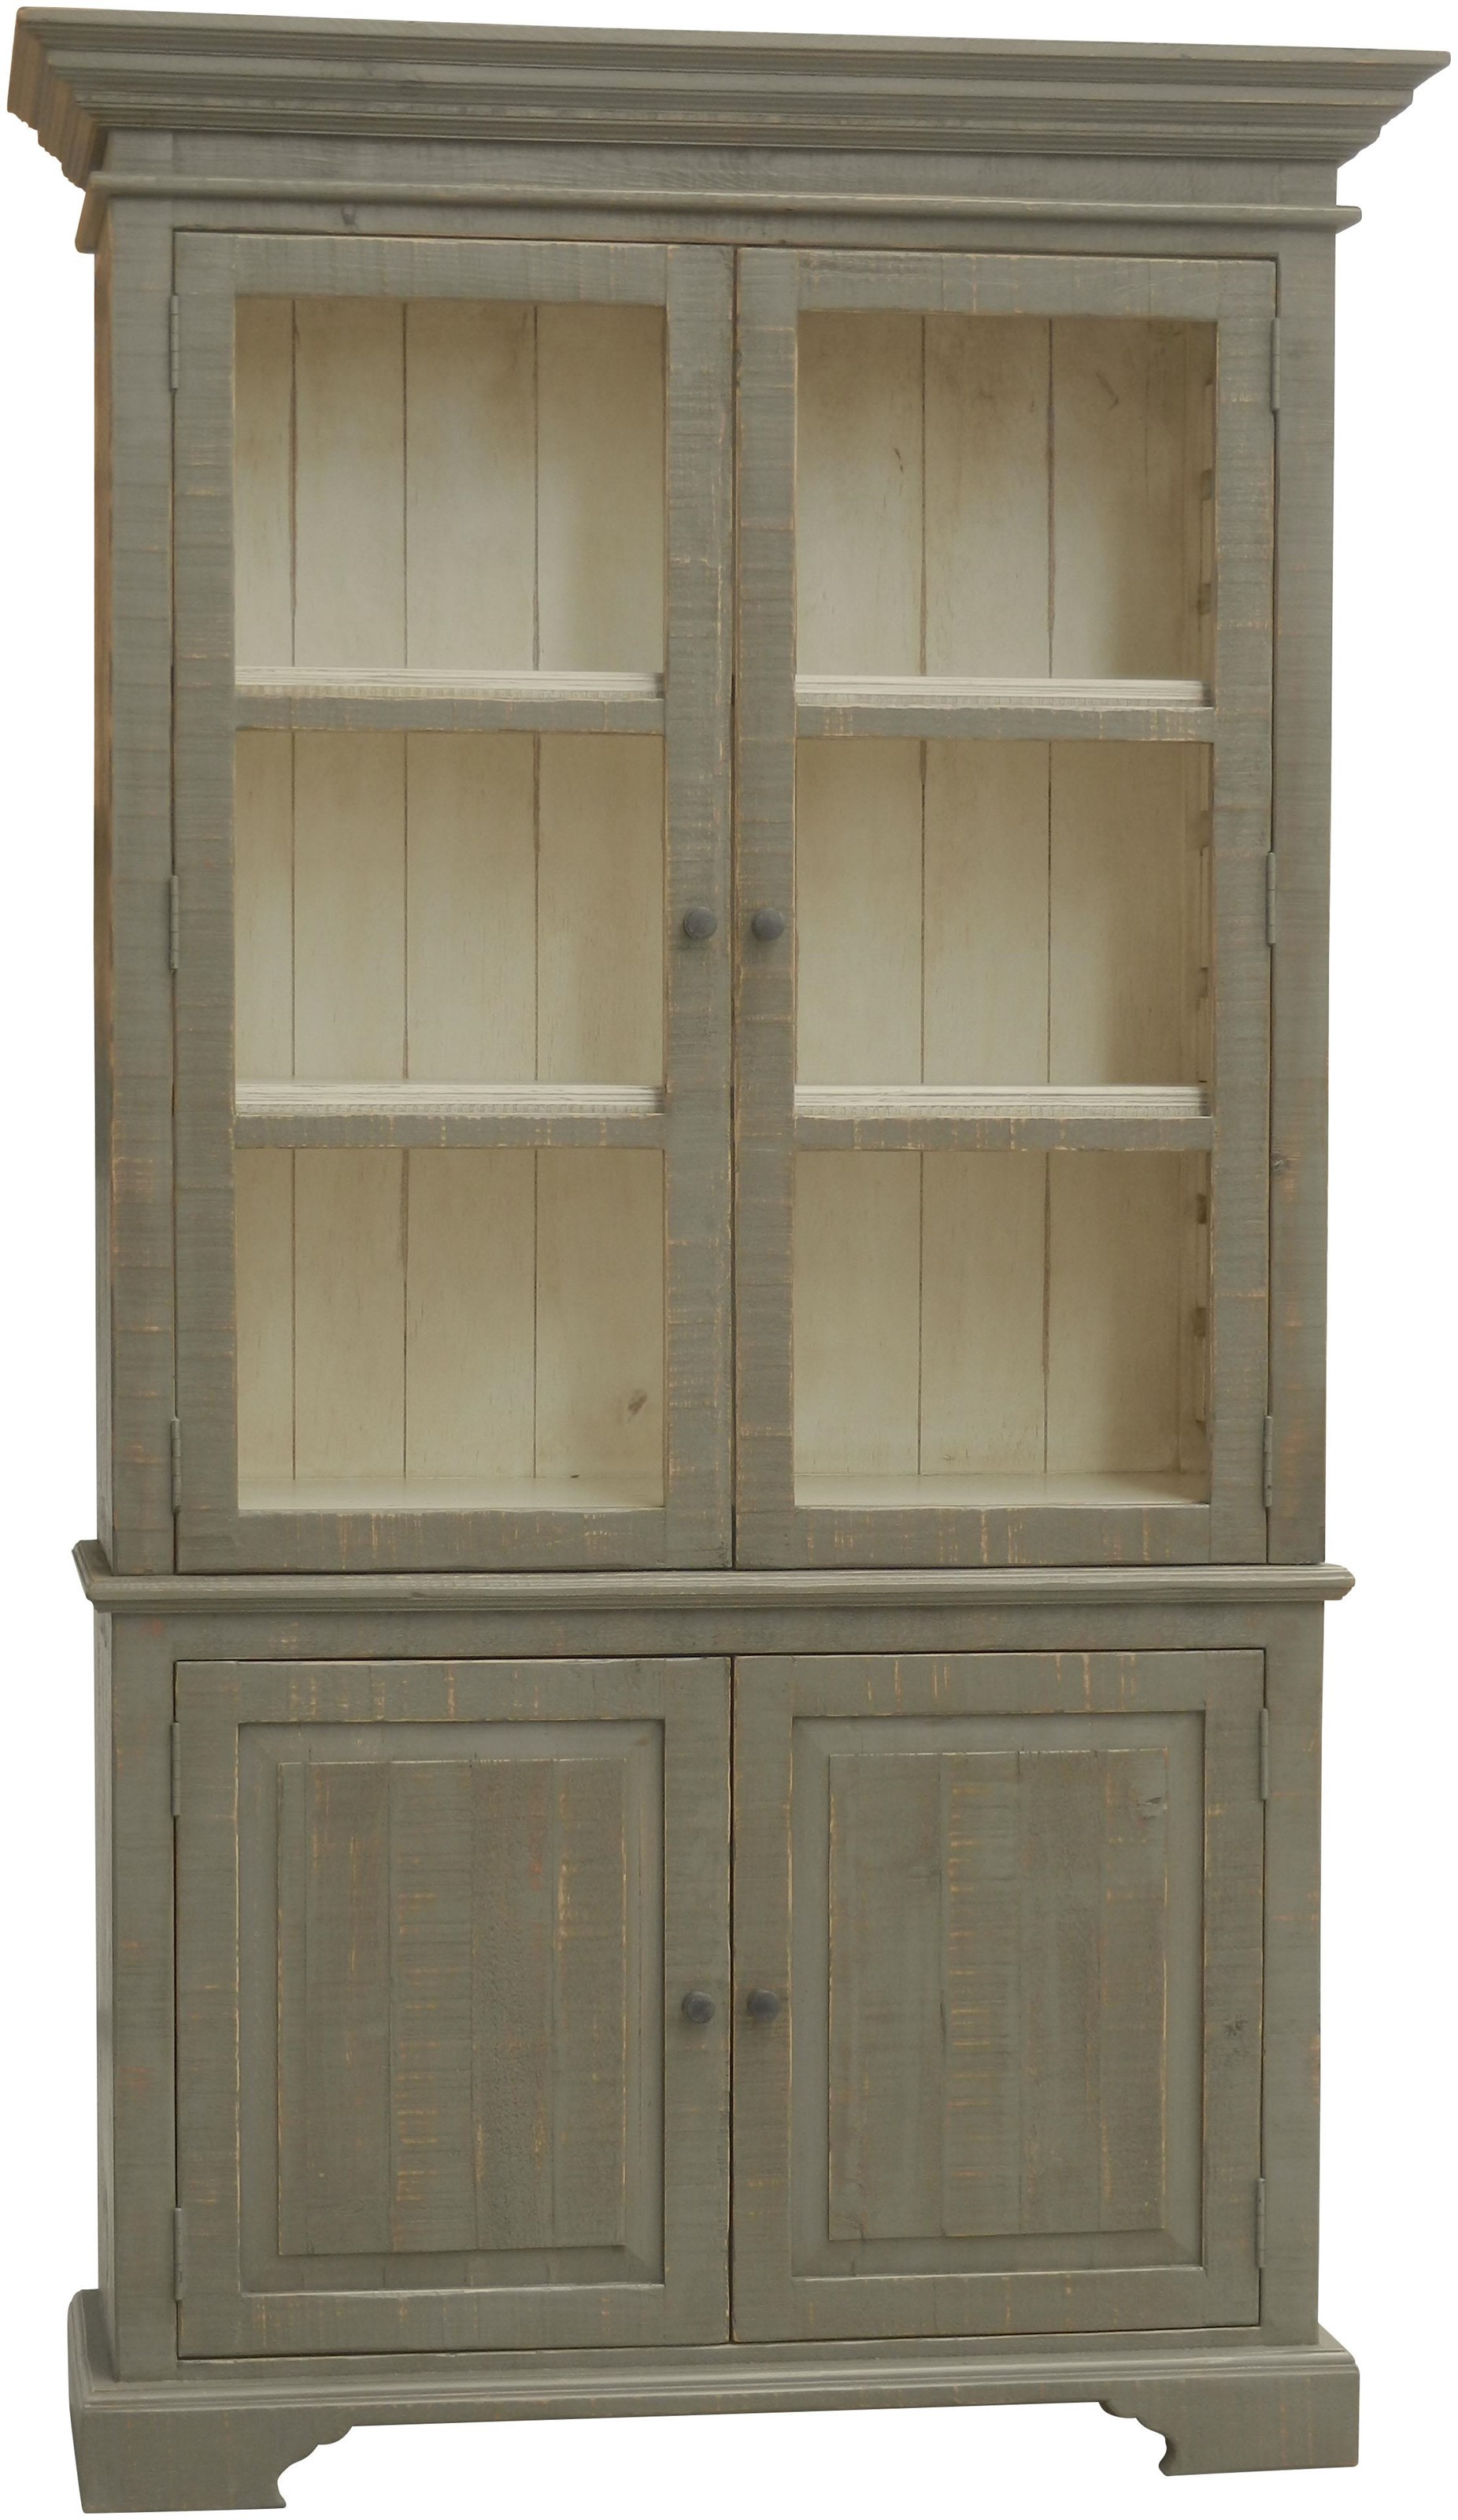 Furniture Source International Accent Pieces Elaine Display Cabinet - Item Number: GRP-86HUT-HUTCH